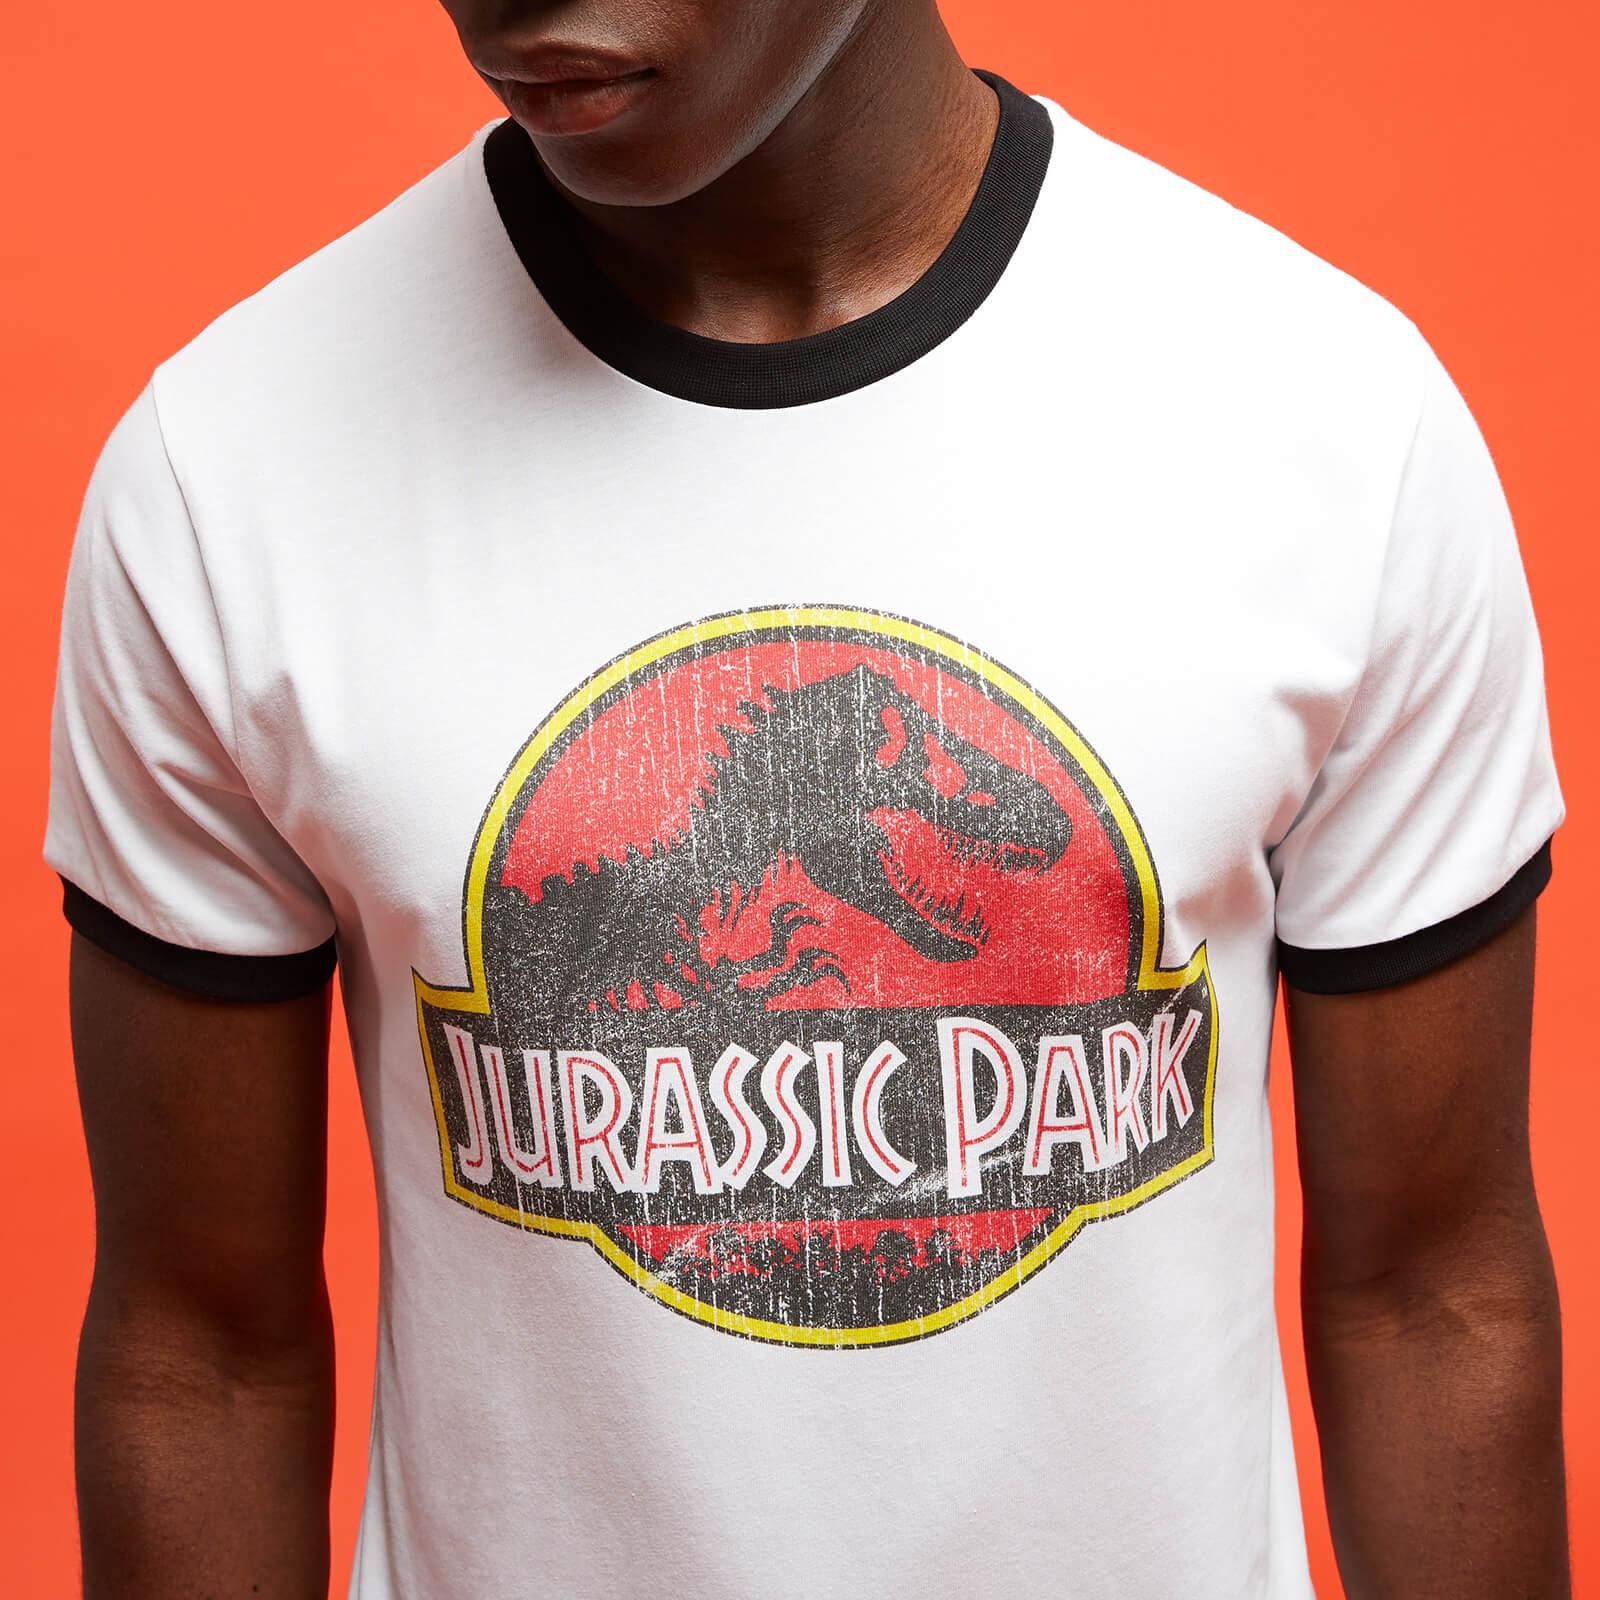 Black Friday bei Zavvi: 60% Rabatt auf Jurassic Park-Kleidung - z. B. T-Shirts, Langarm-Shirts, Hemden